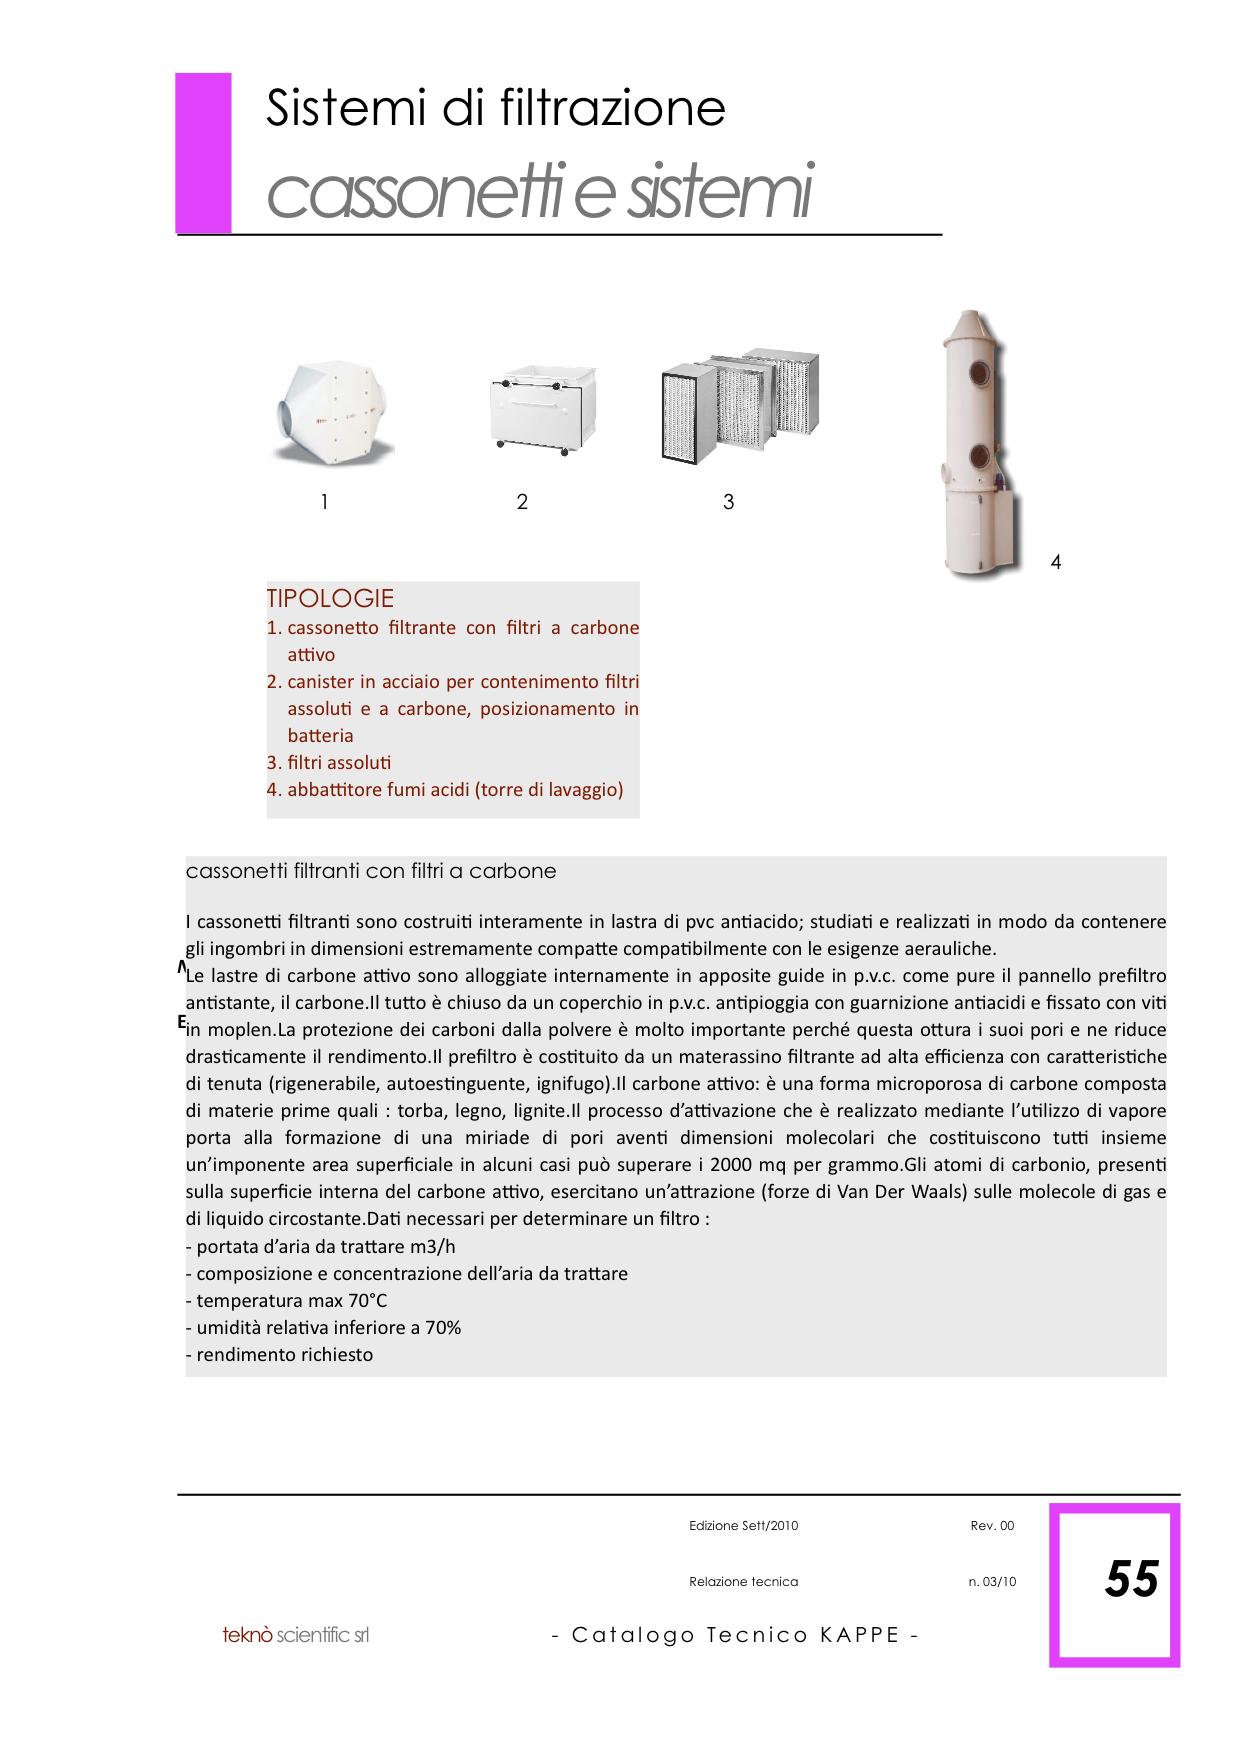 KAPPE Catalogo Tecnico Generale copia 5.png